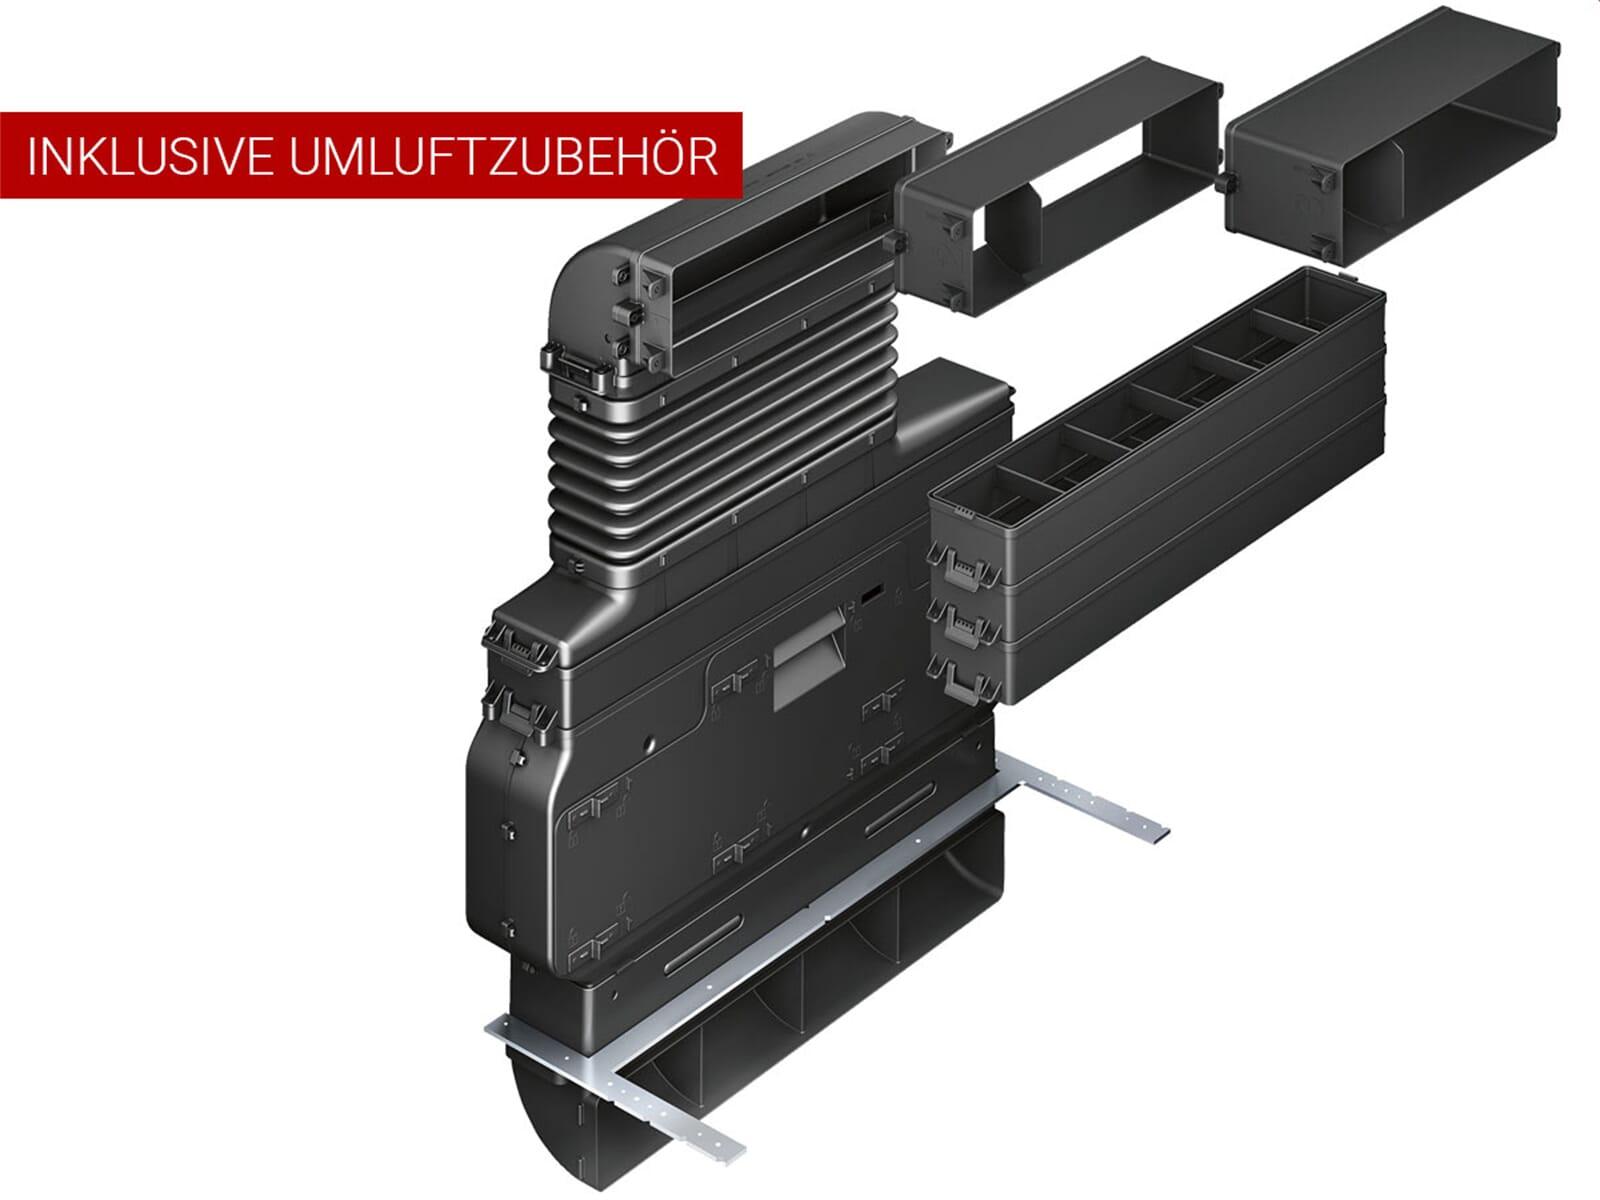 Set Siemens studioLine Dampfgar-Backofen HS836GVB6 + Gaggenau CV282100 Kochfeldabzug Umluft